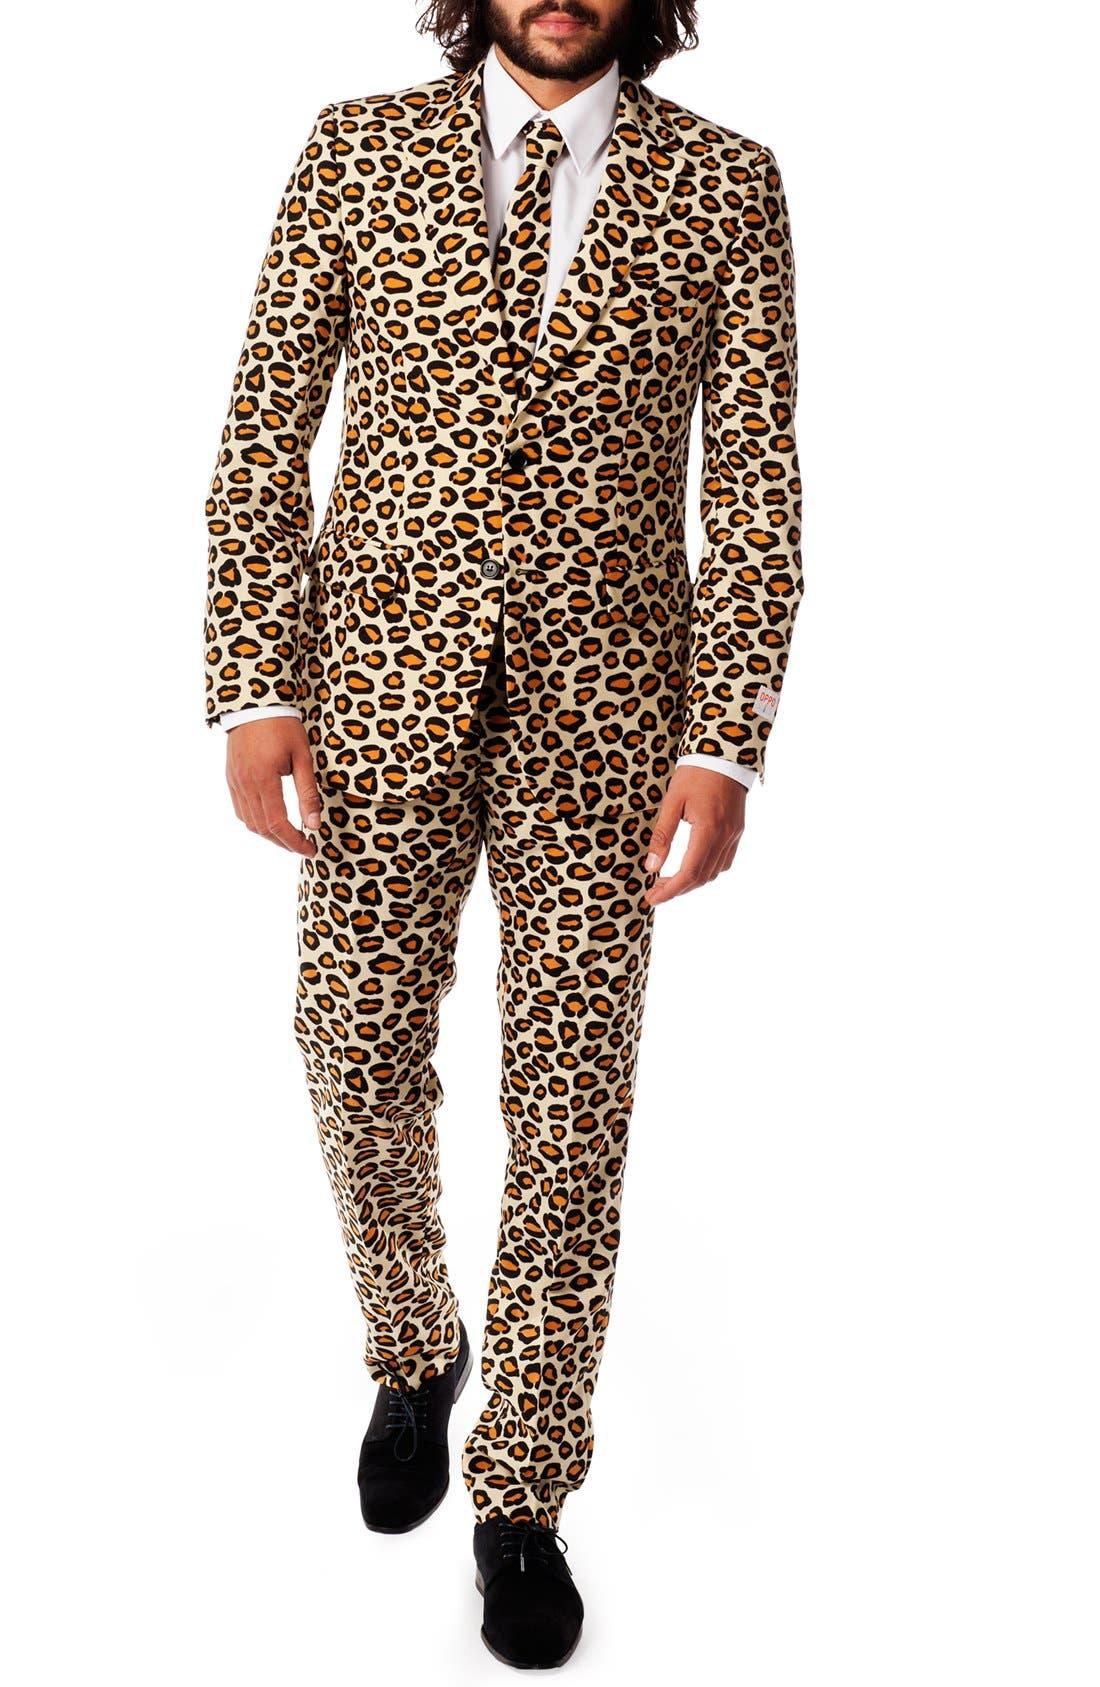 'The Jag' Trim Fit Two-Piece Suit with Tie,                             Main thumbnail 1, color,                             251